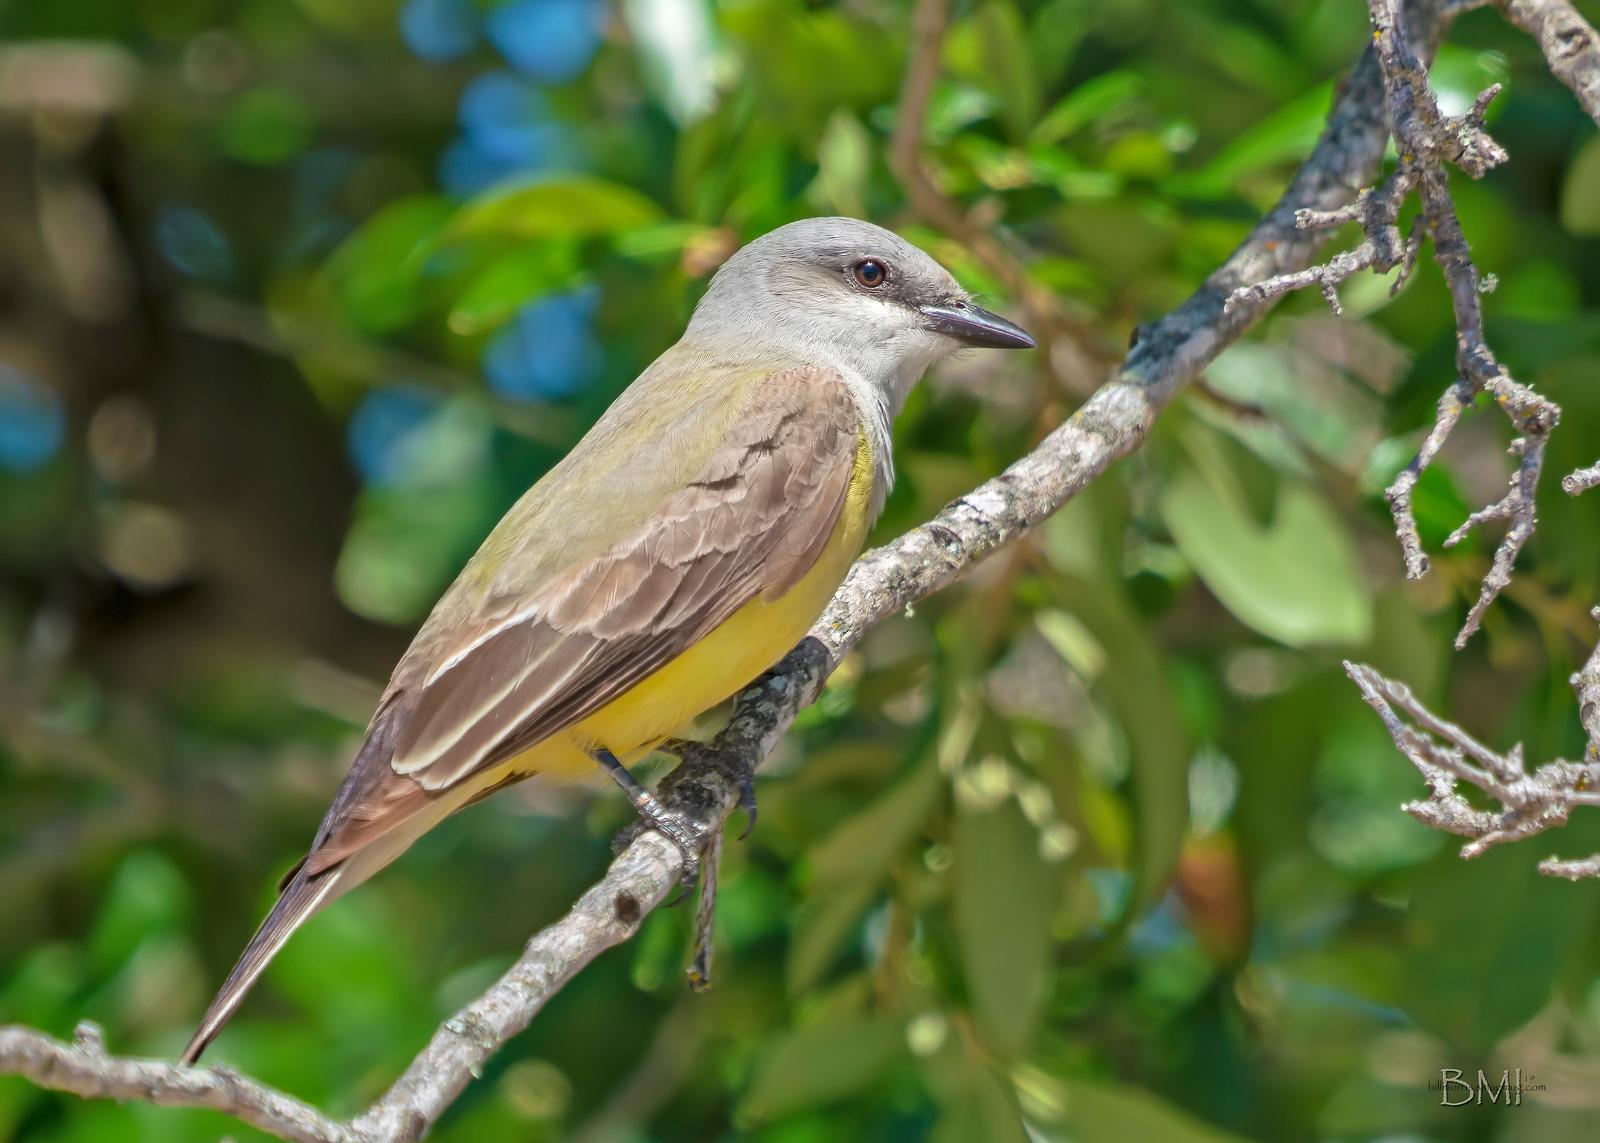 IMAGE: https://photos.smugmug.com/Private/n-XQ9MPw/Birds/Birds/i-j5RXX6g/2/f488a5fc/X3/Western%20kingbird%205-13-19-27-X3.jpg